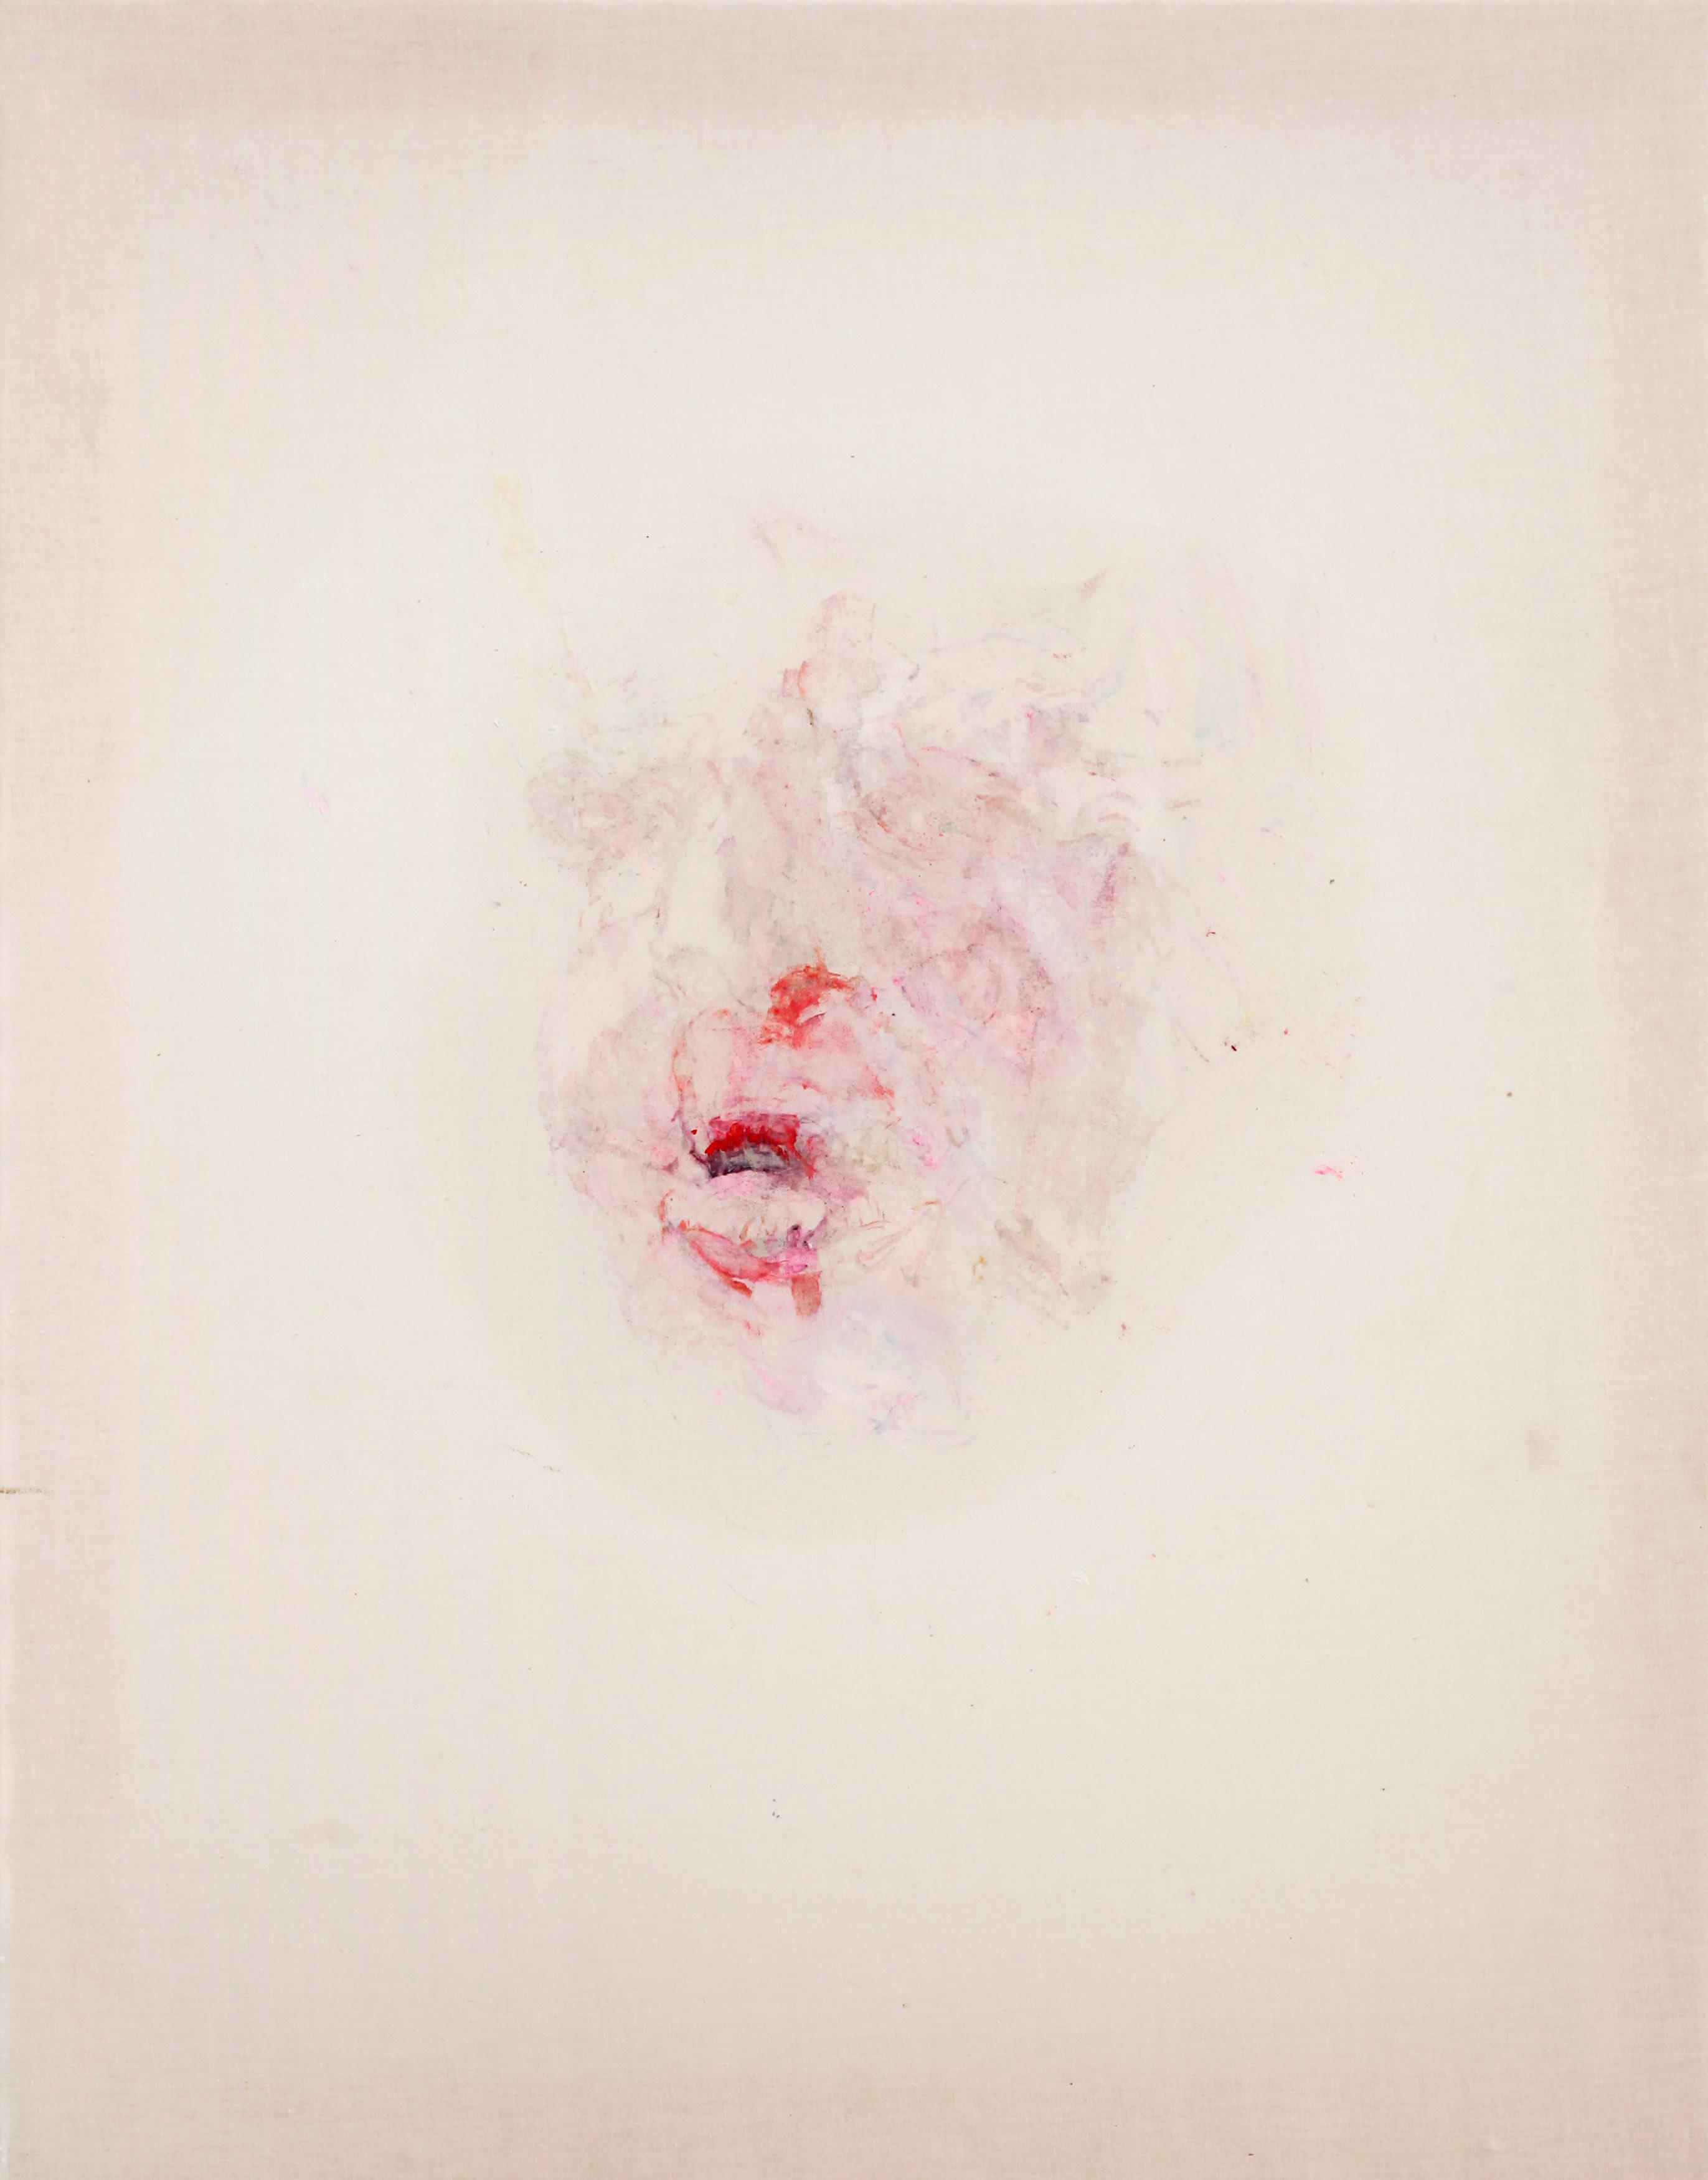 Issa Sant - Last moments (study), 2012